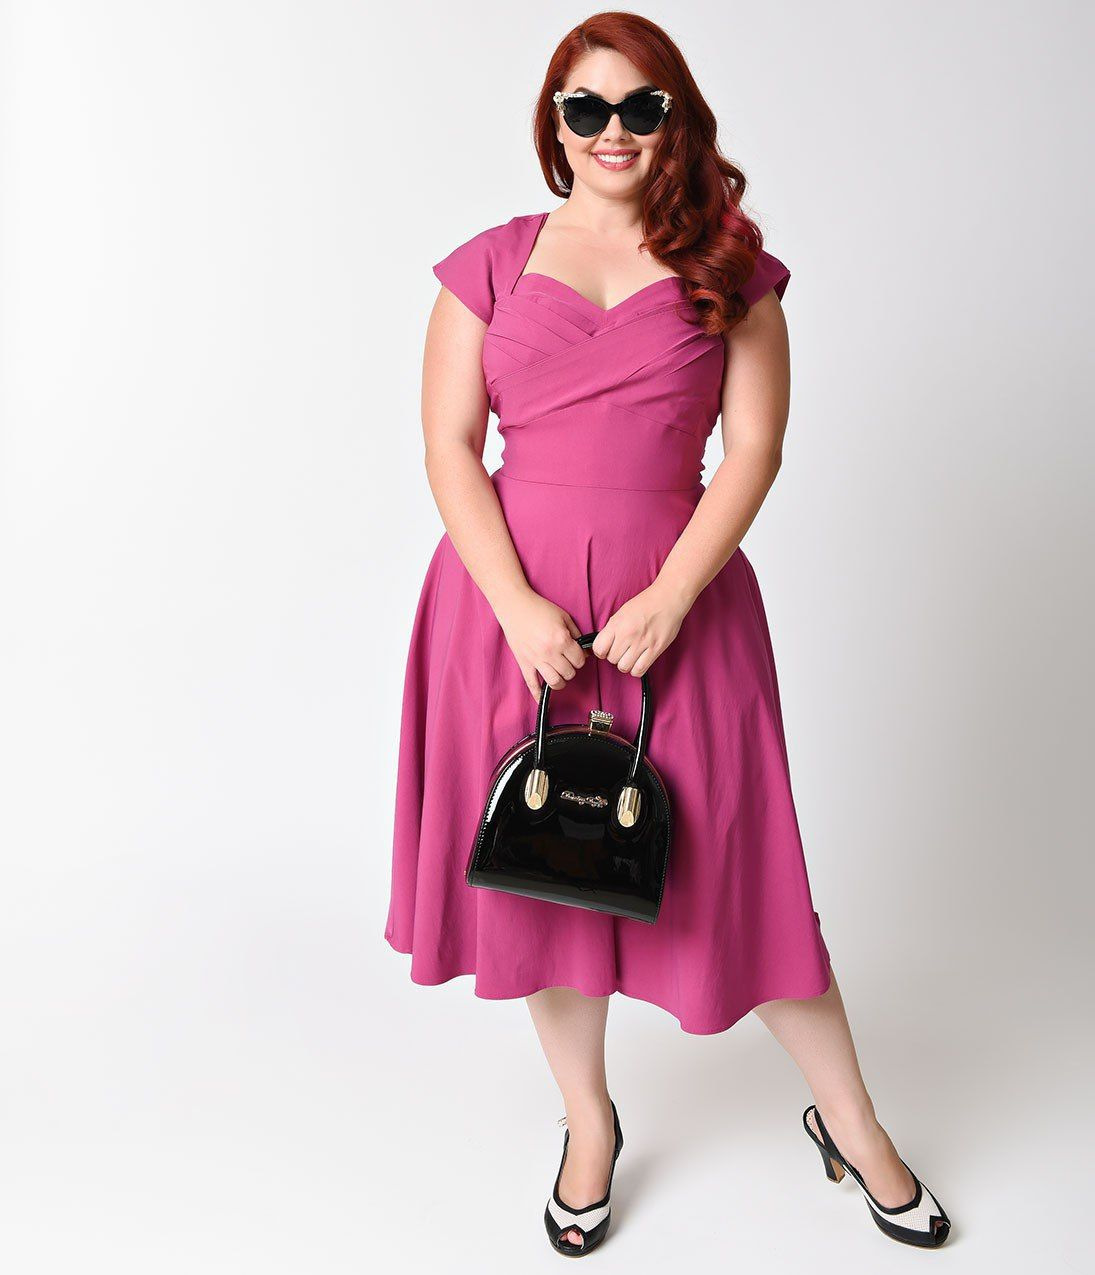 modelos para hacer vestidos para gorditas | Pinup | Pinterest ...